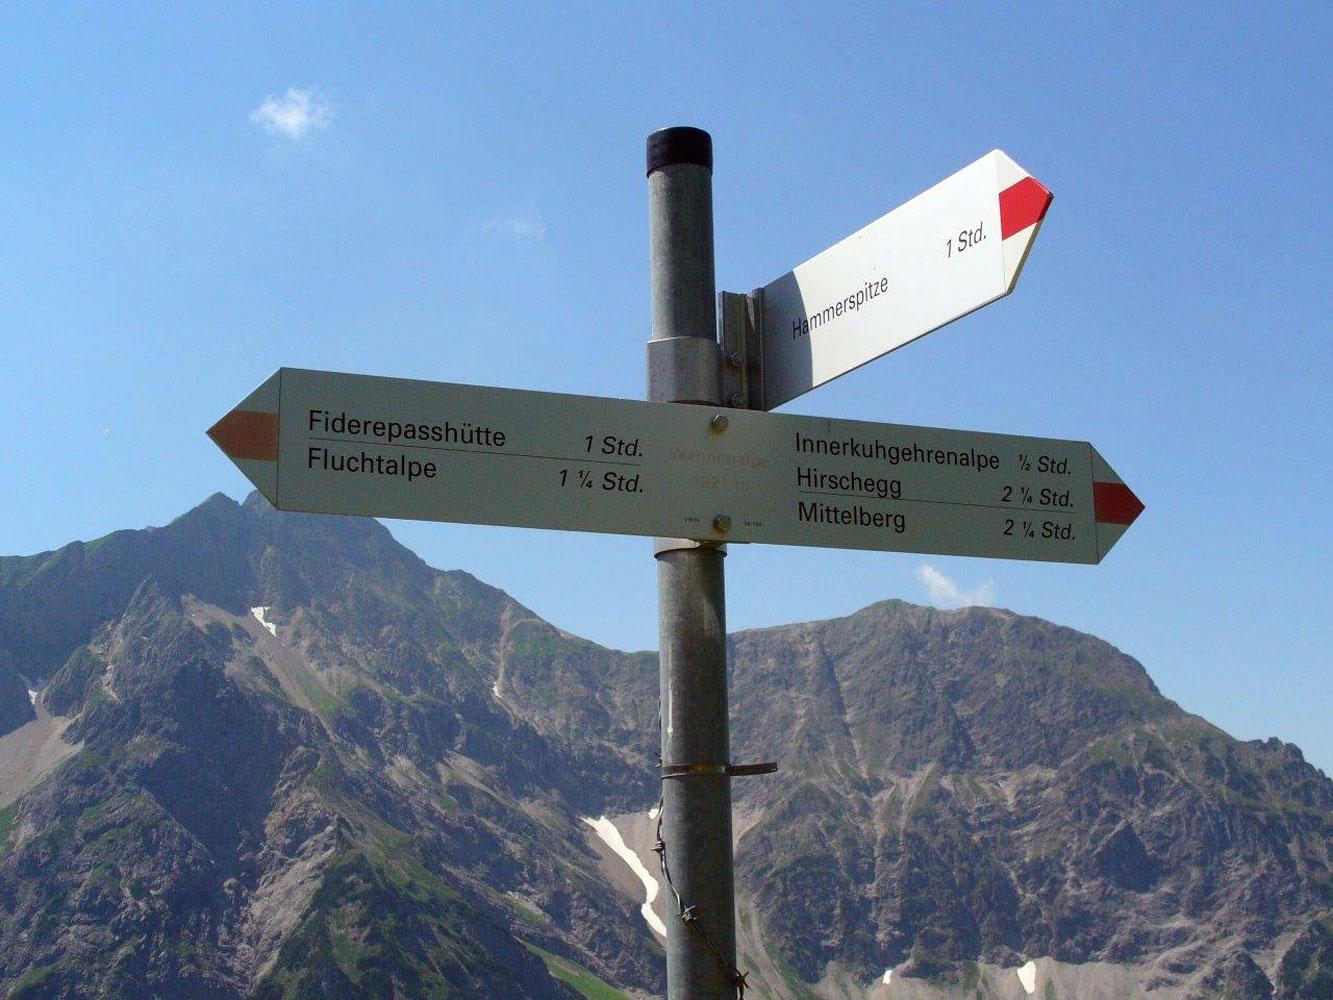 Innere Wiesalpe Kleinwalsertal, Ausflugsziel, Alpe, Brotzeit – Wegweiser